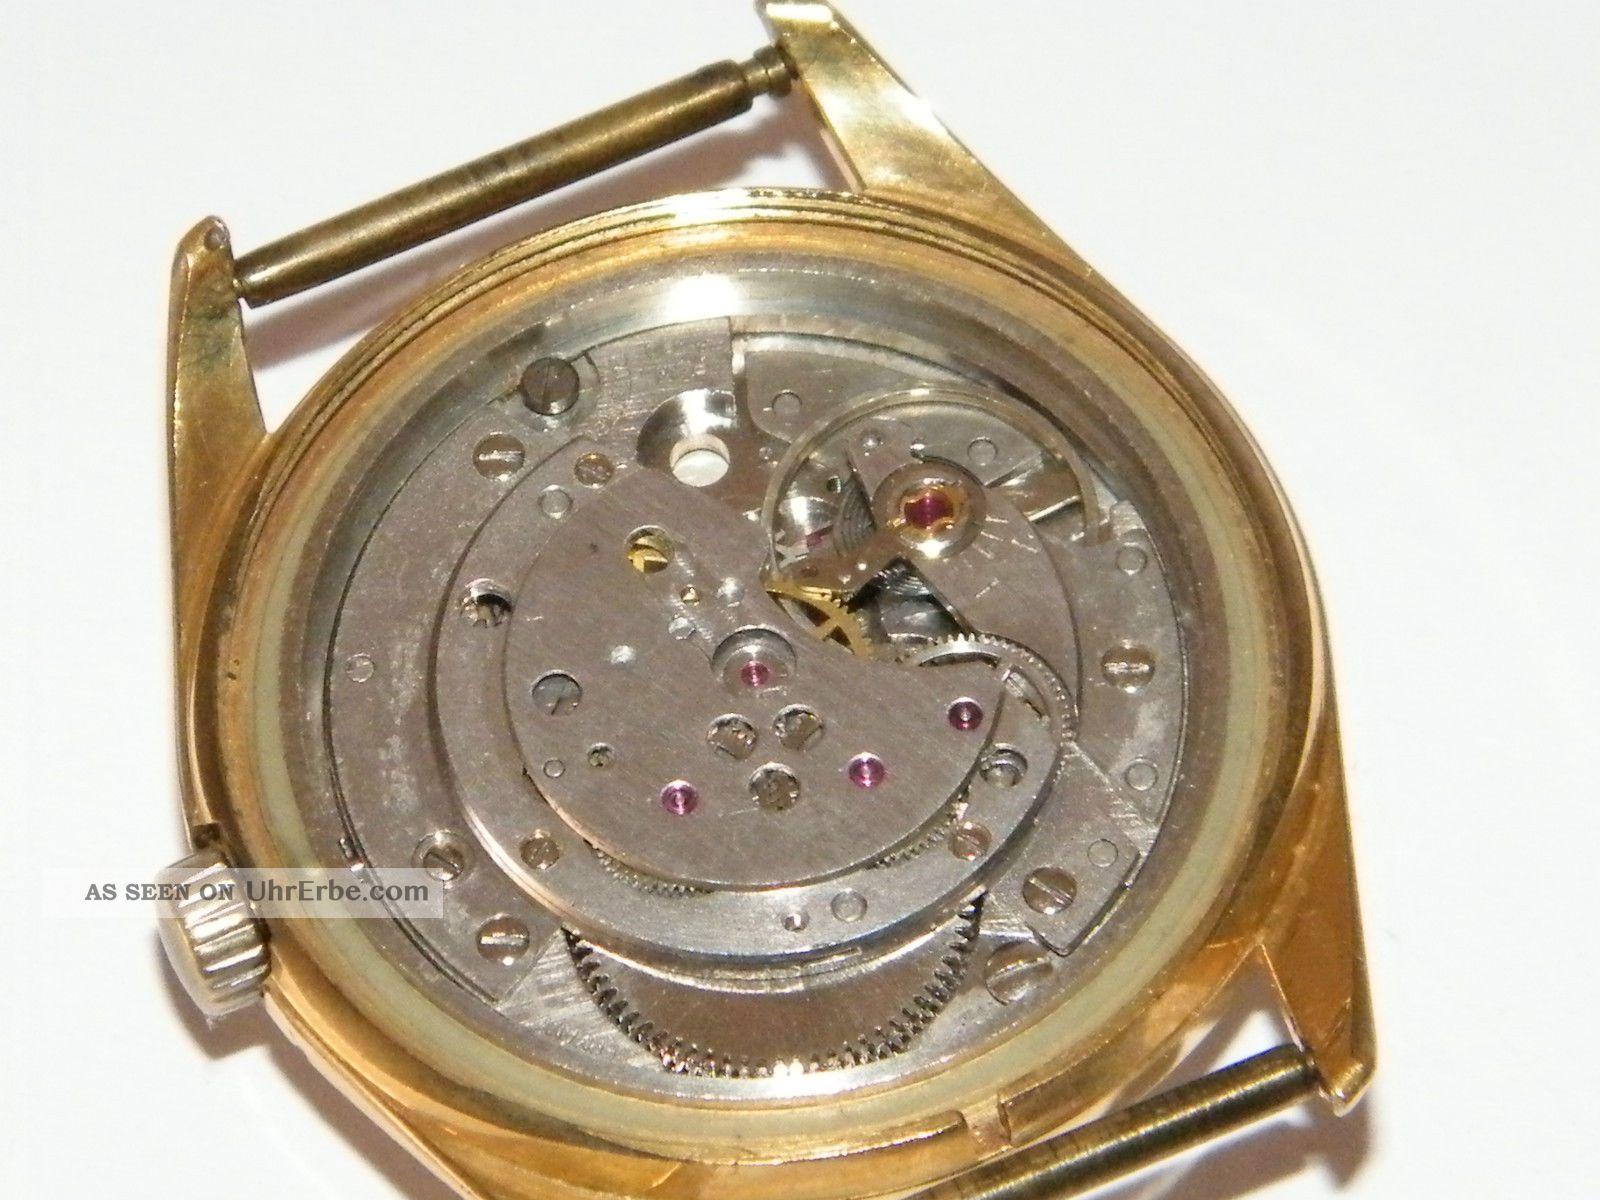 Porta Automatic, Armbanduhr Herren, Wrist Watch, Repair ...